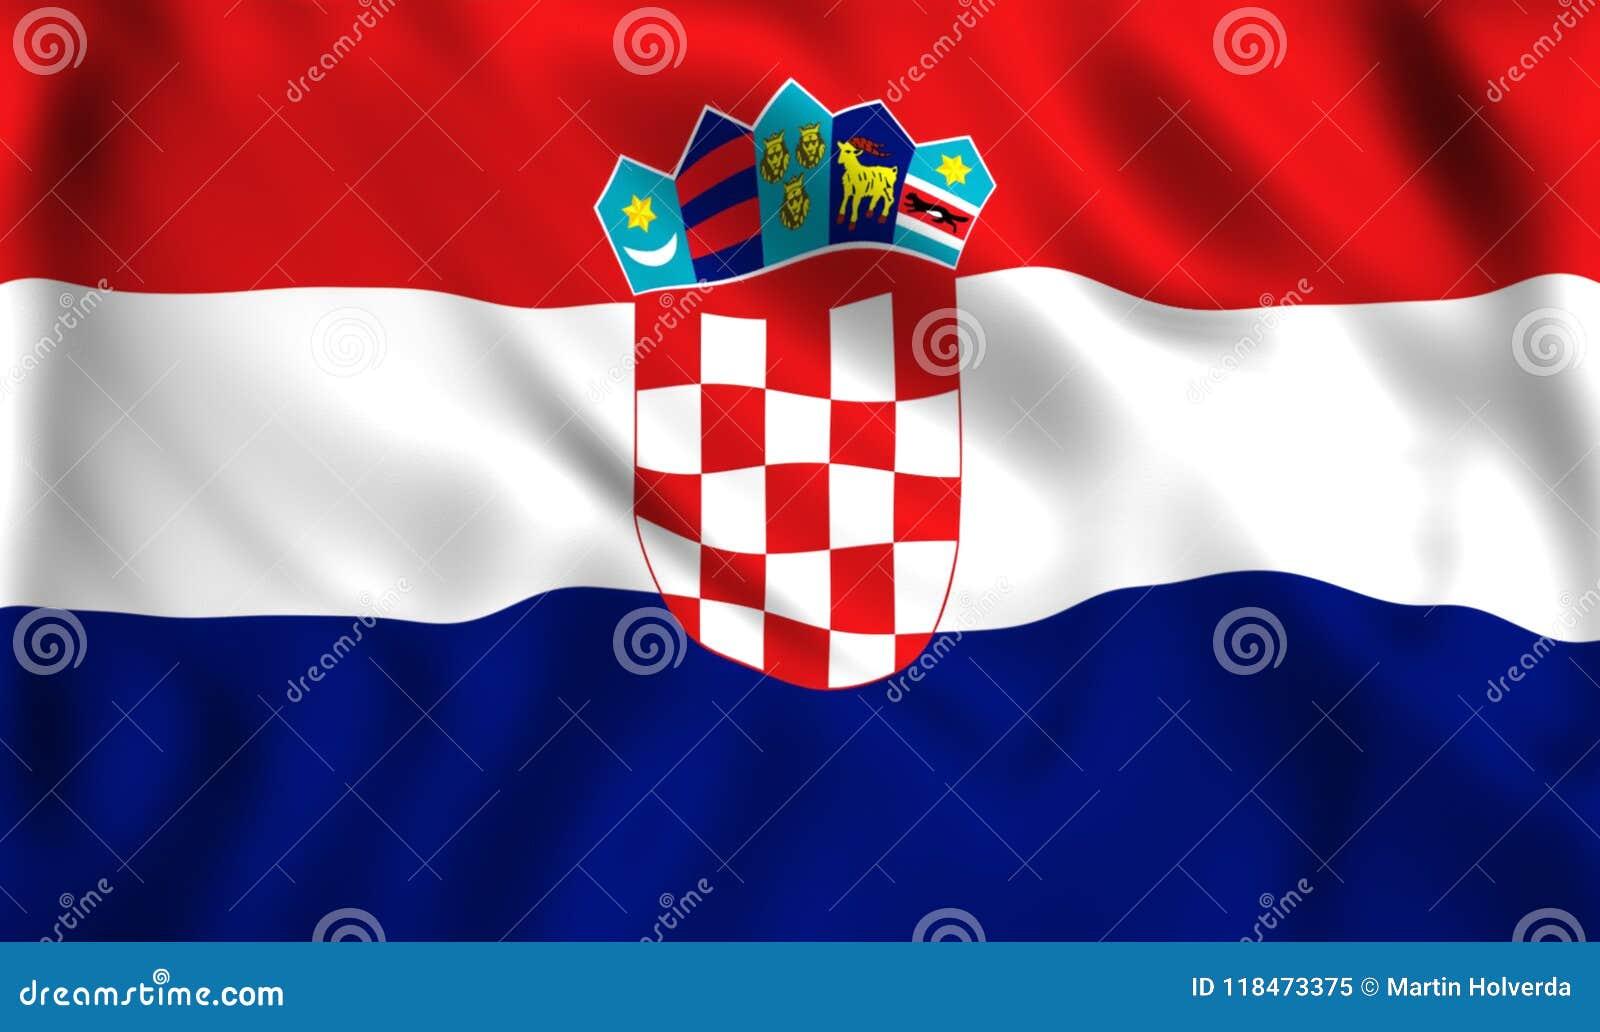 Croatia Flag Waving In The Wind Symbol Of Croatia Country Stock